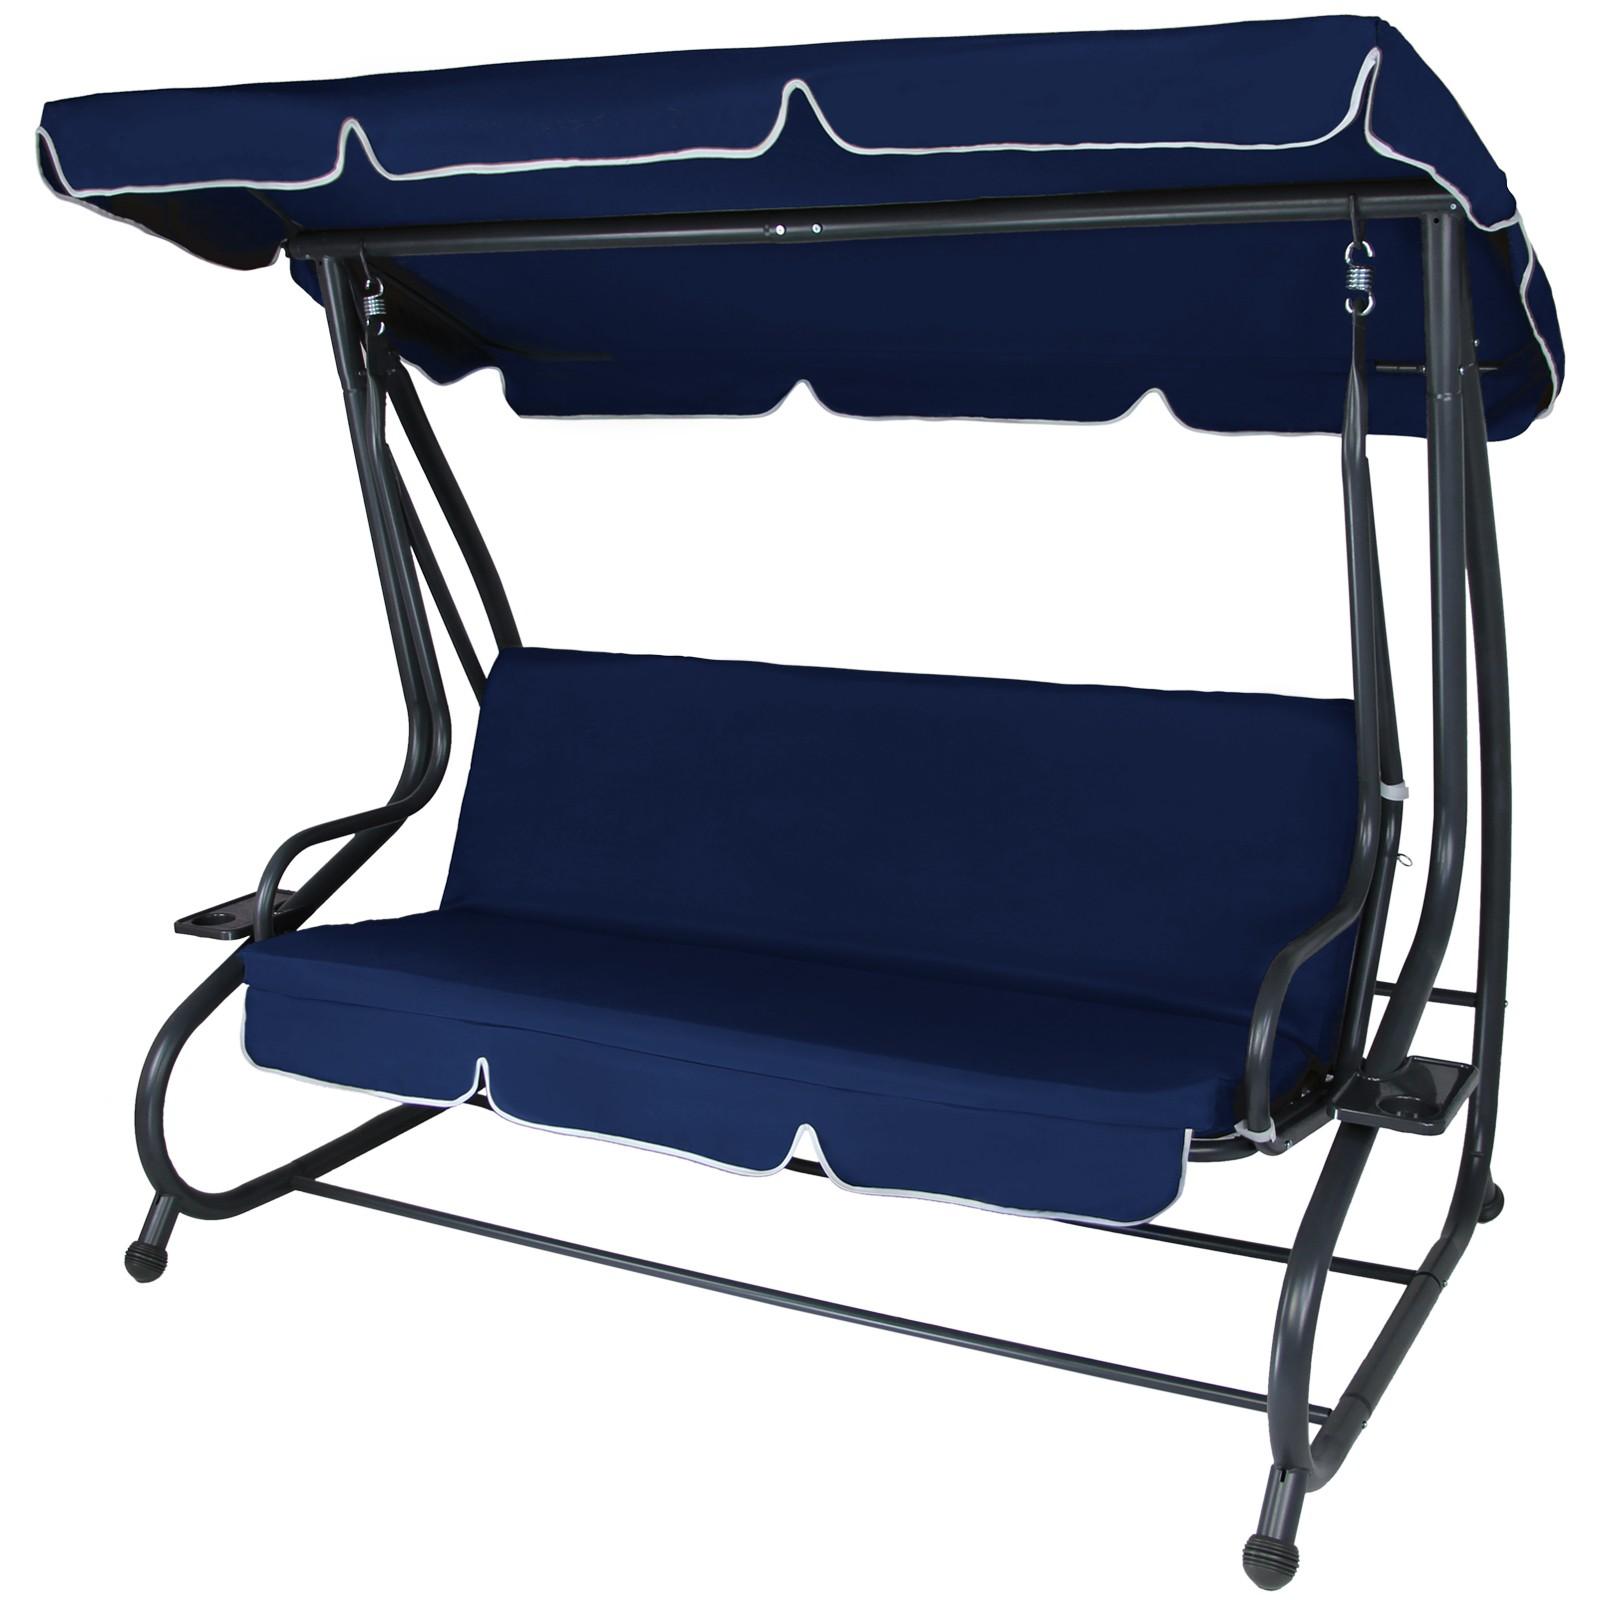 4 Seater Garden Hammock Swing Seat Convertible Bed Ravenna